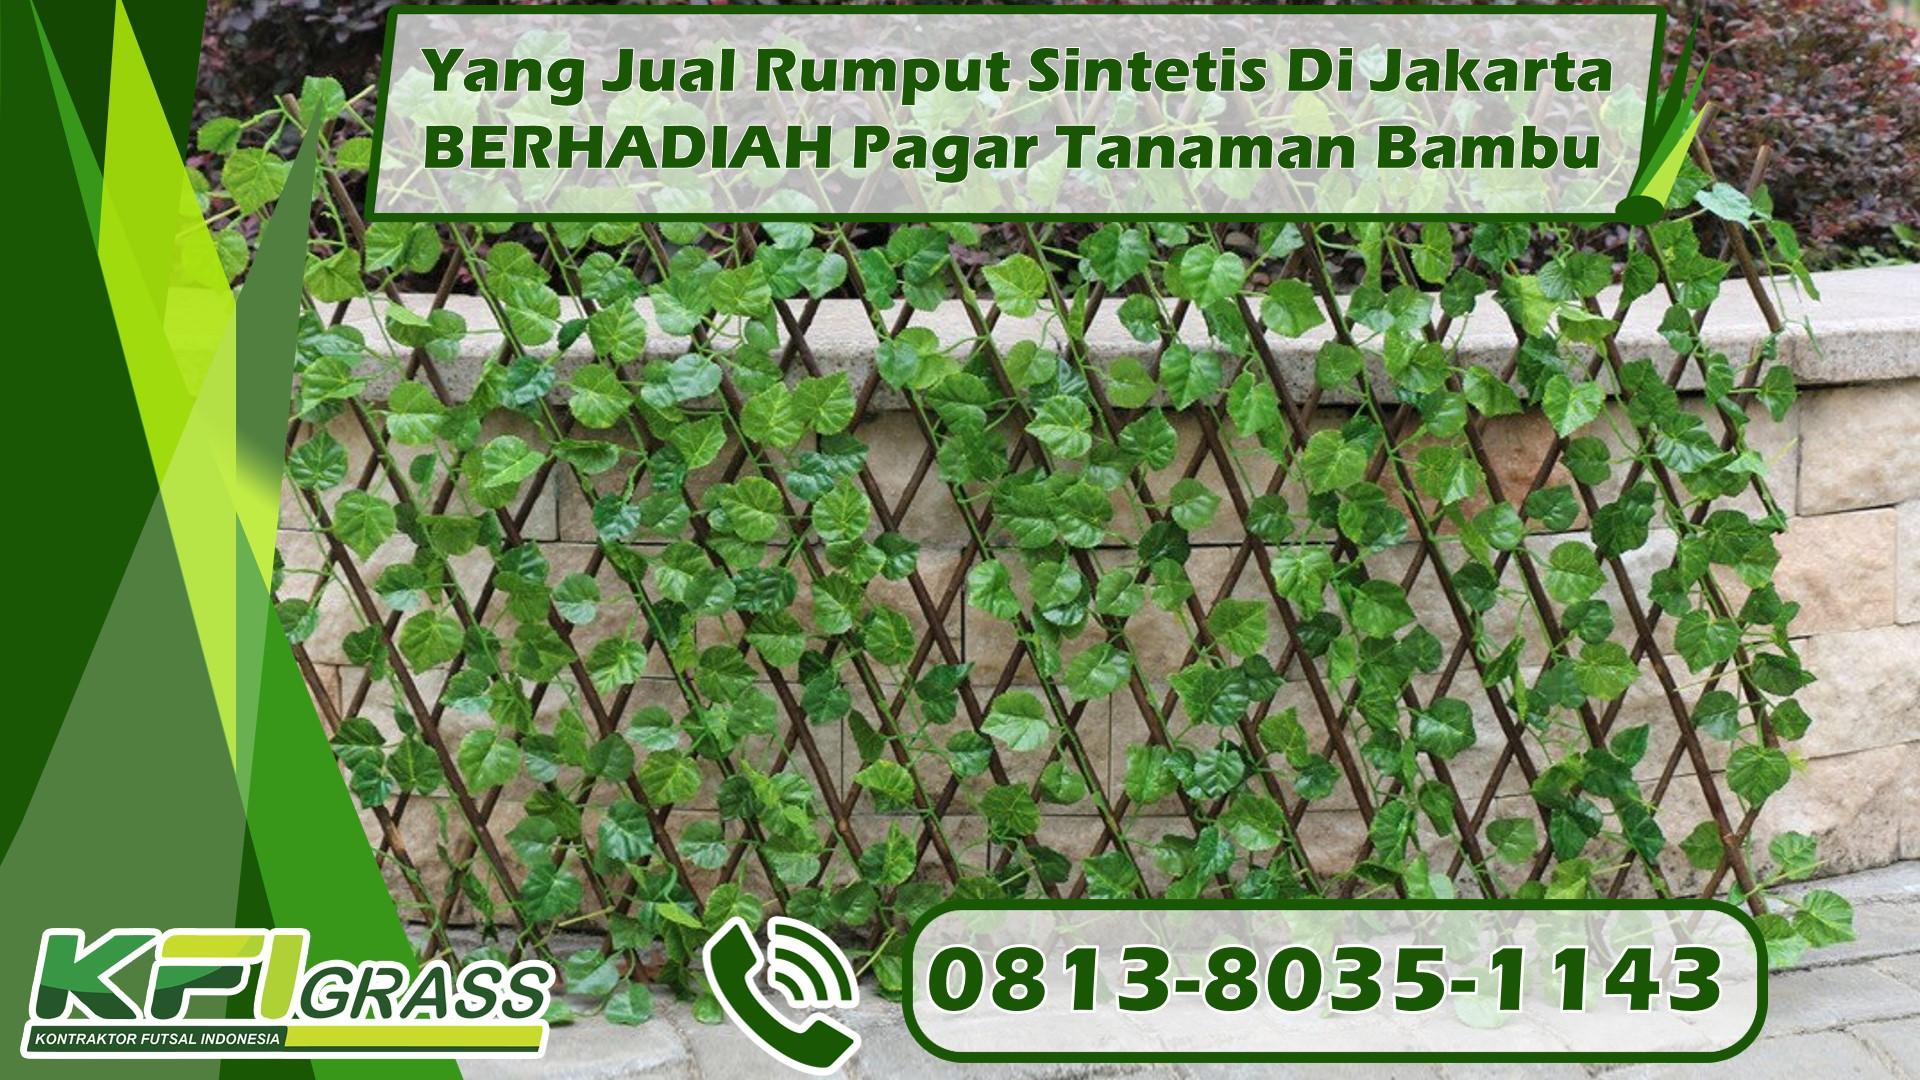 Yang Jual Rumput Sintetis Di Jakarta